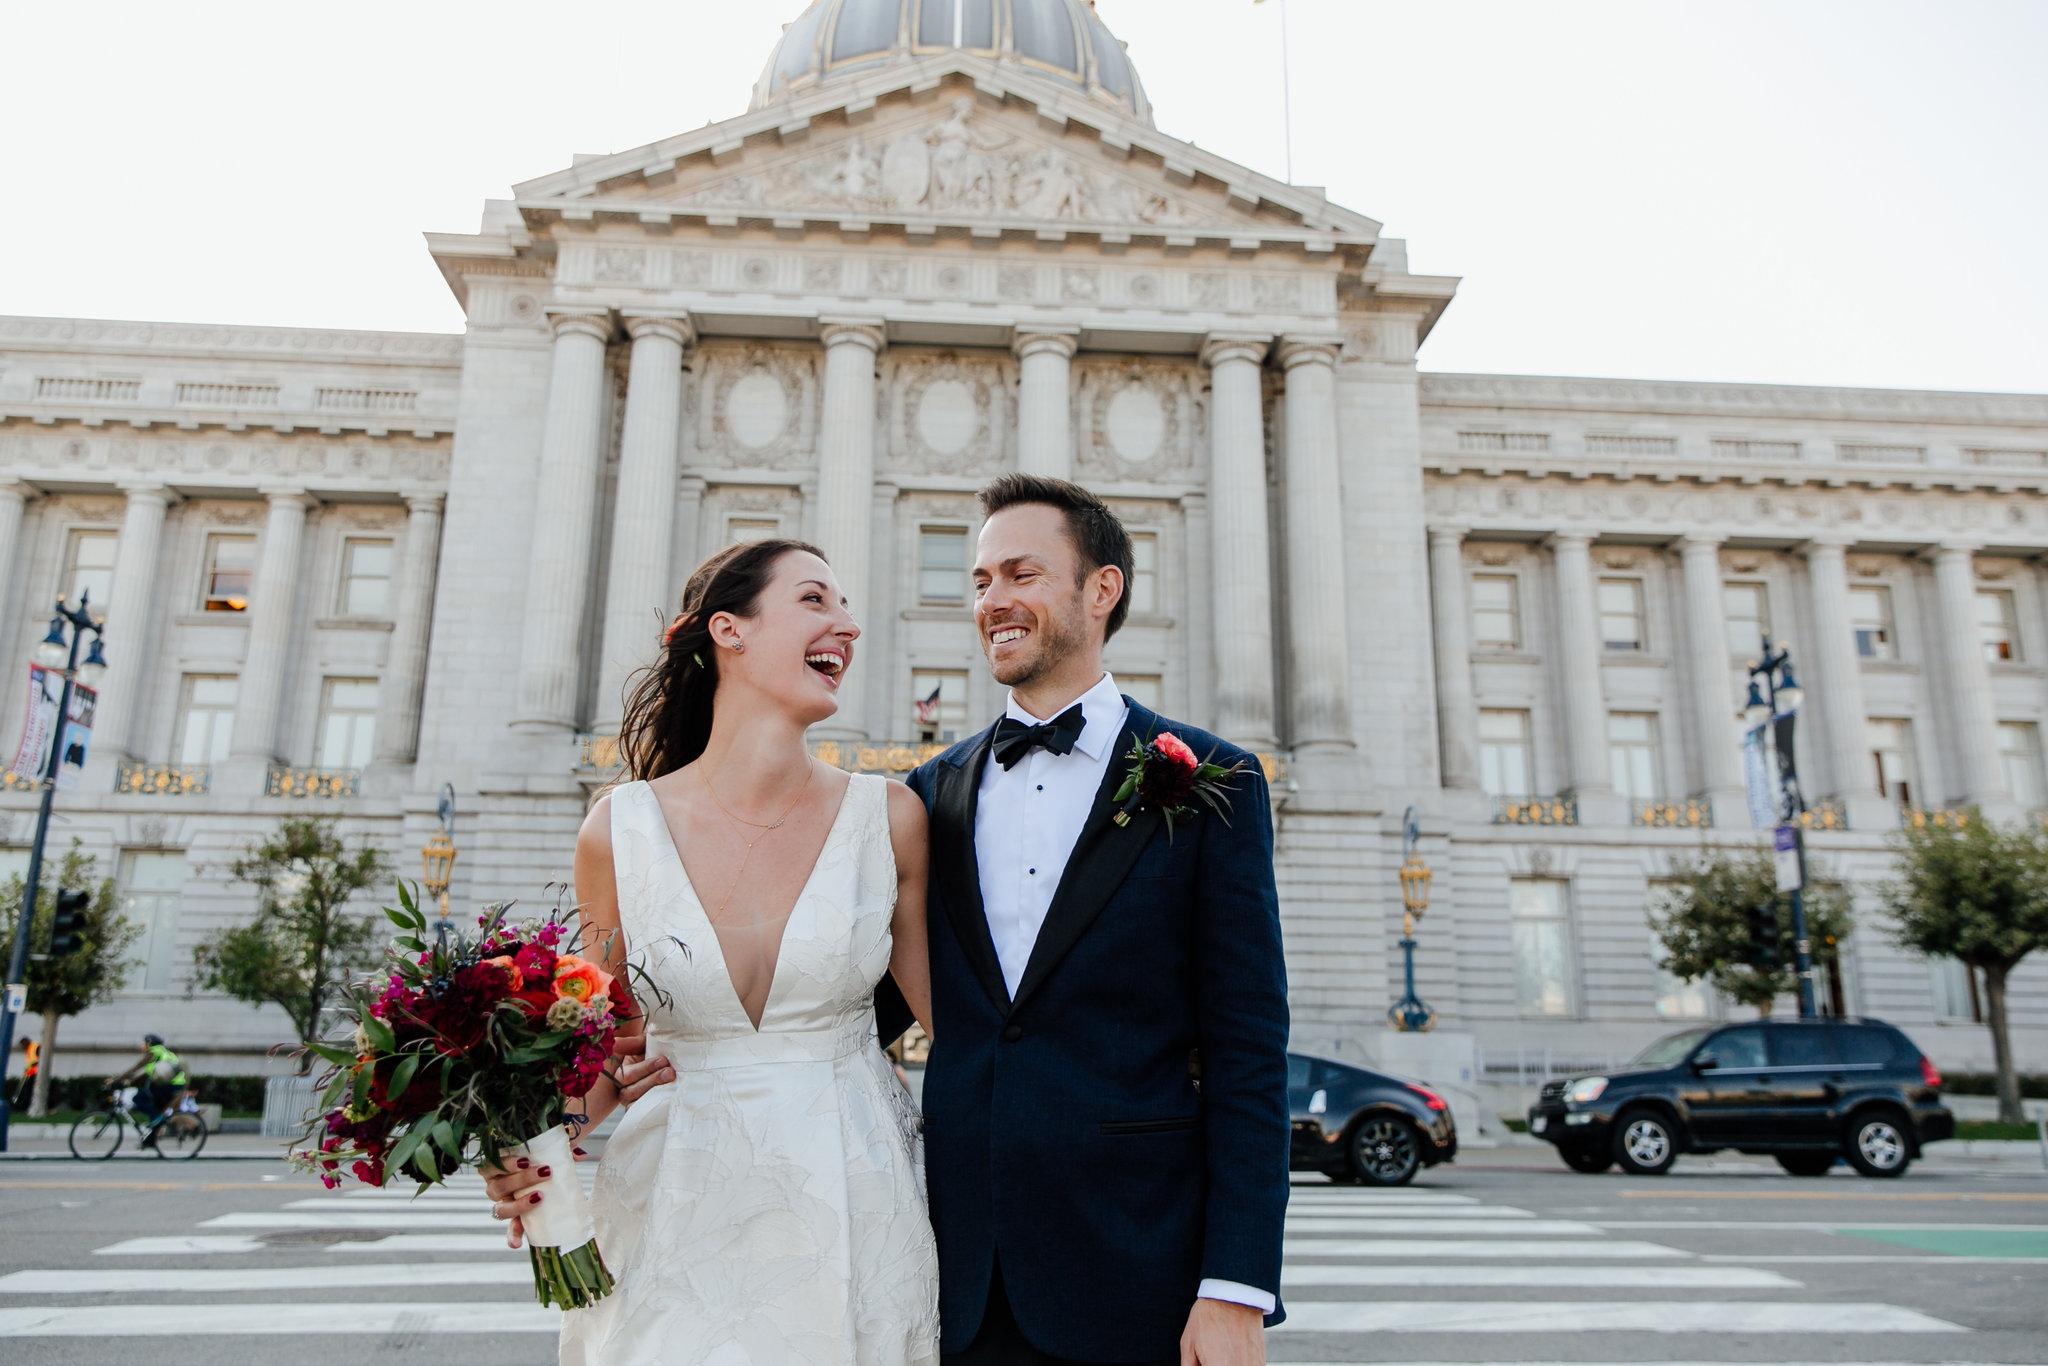 Laid back city hall wedding